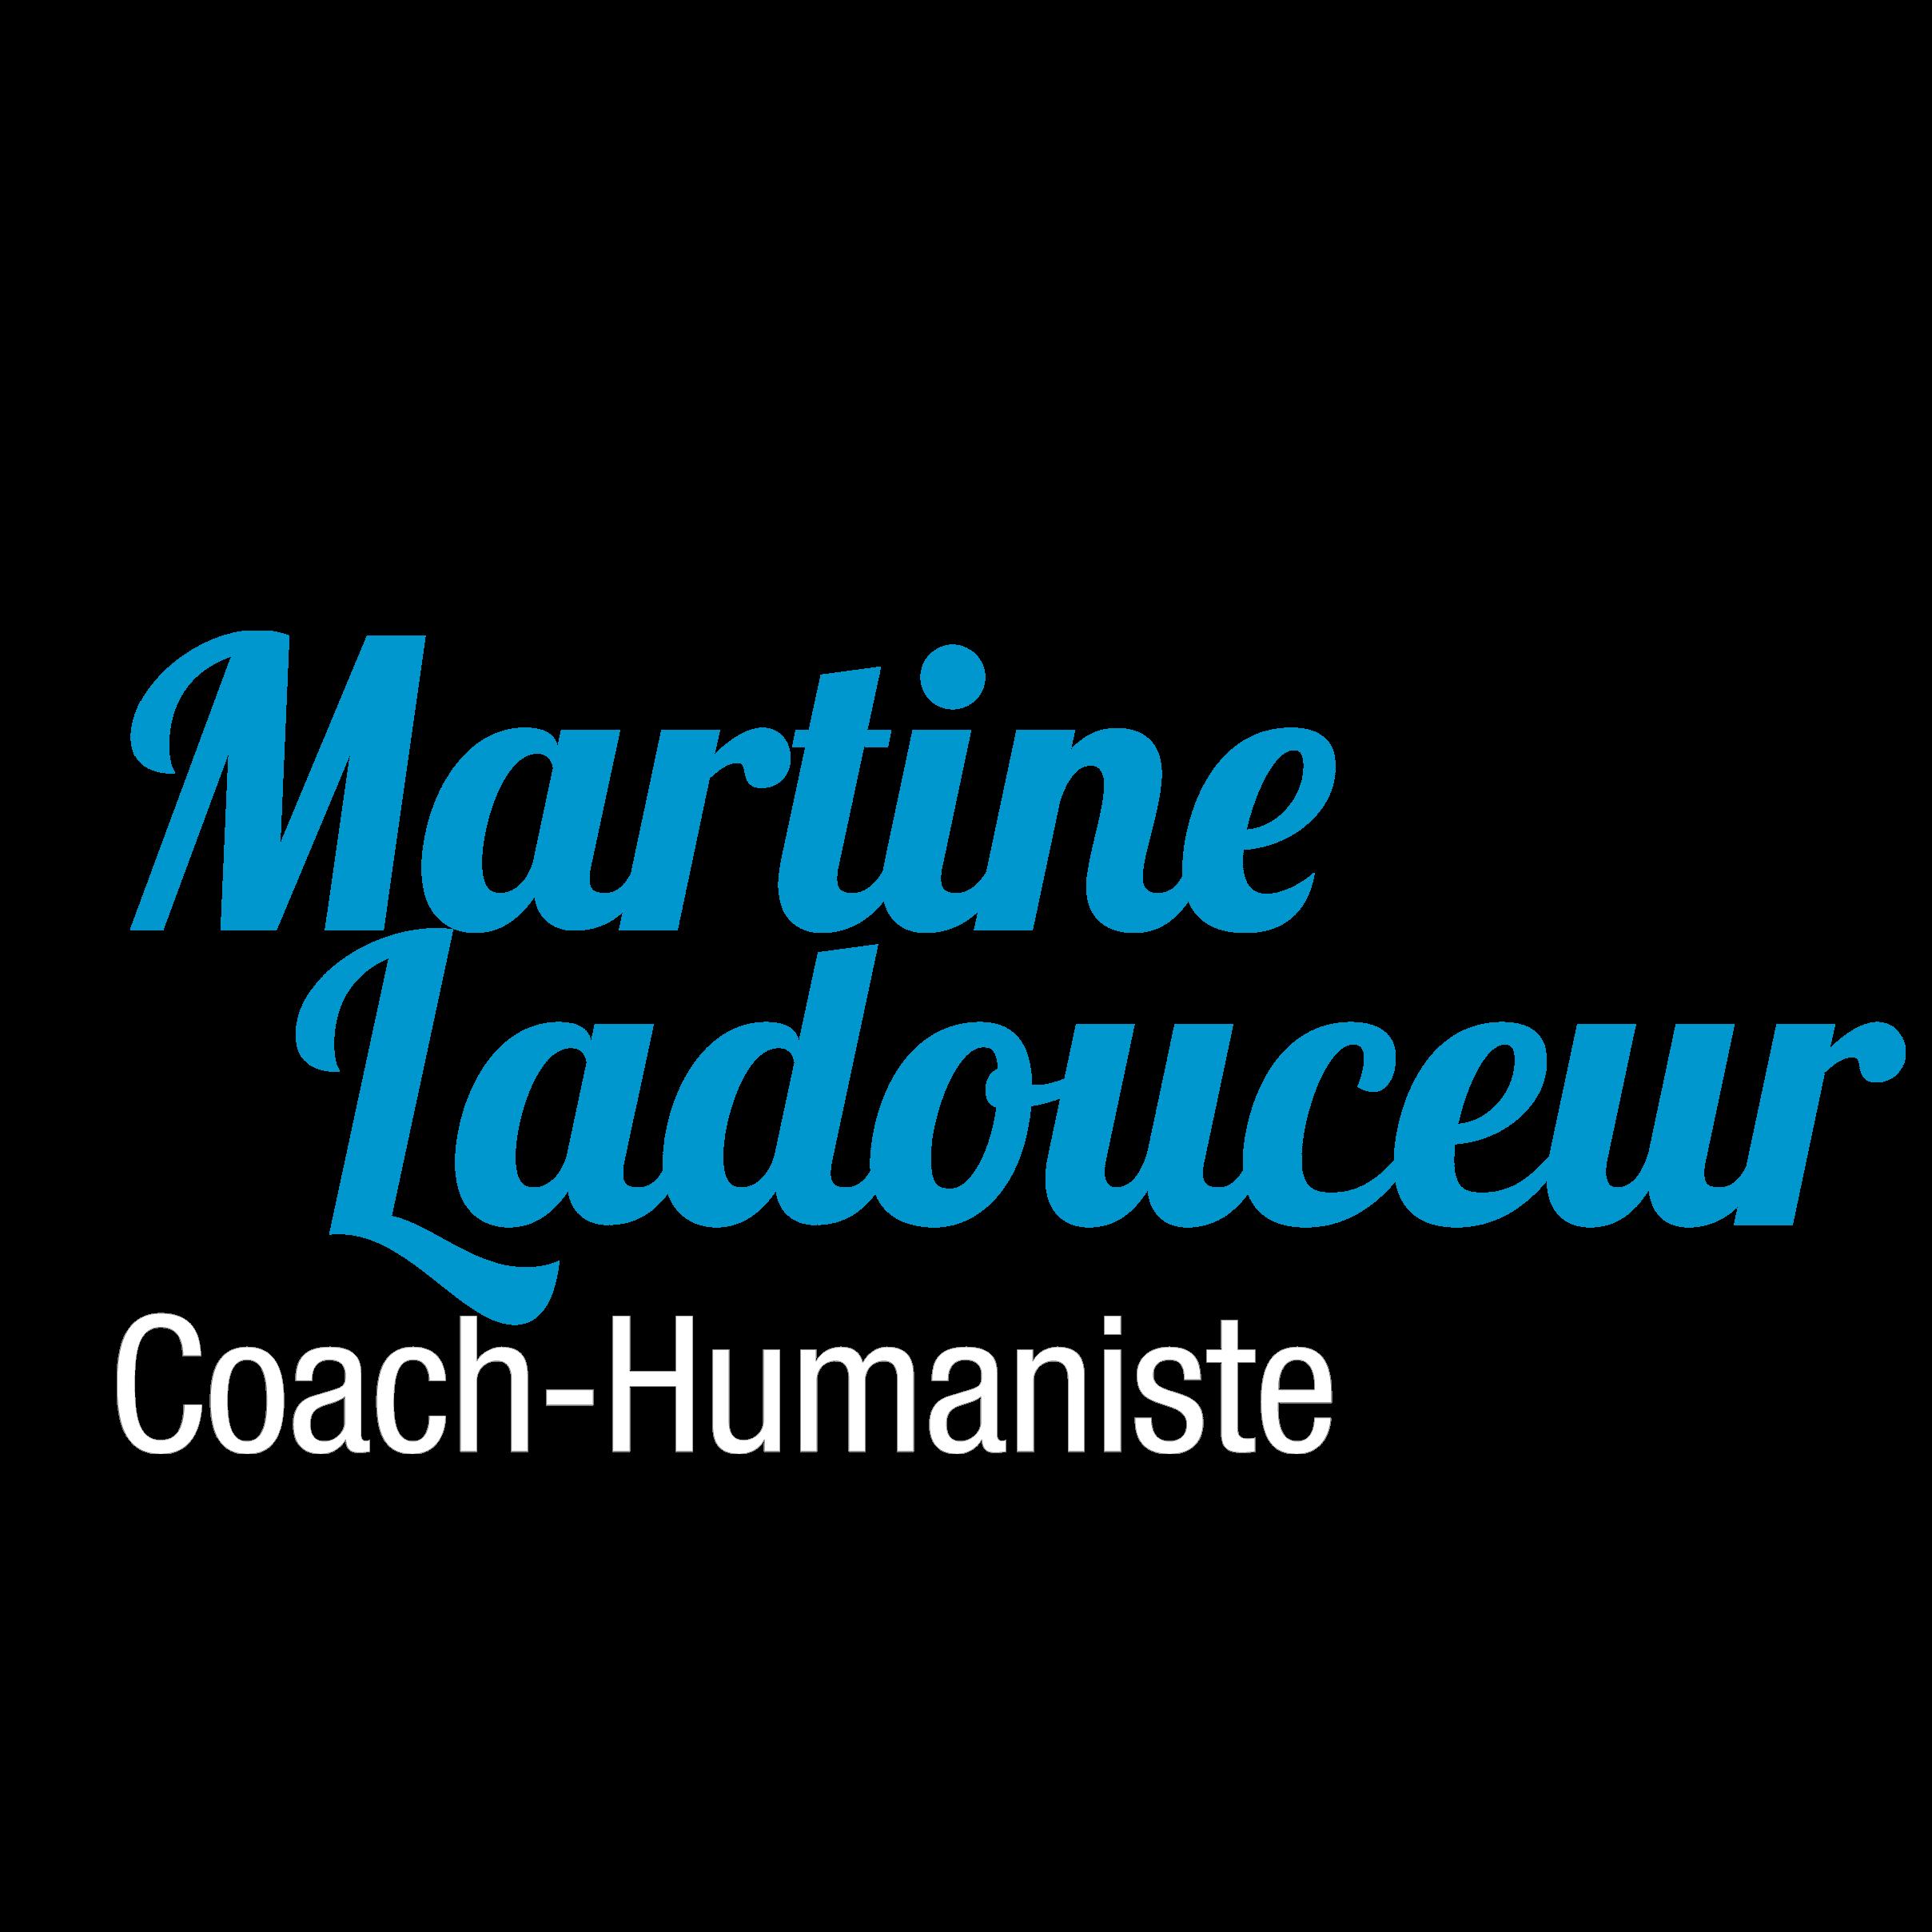 Martine Ladouceur